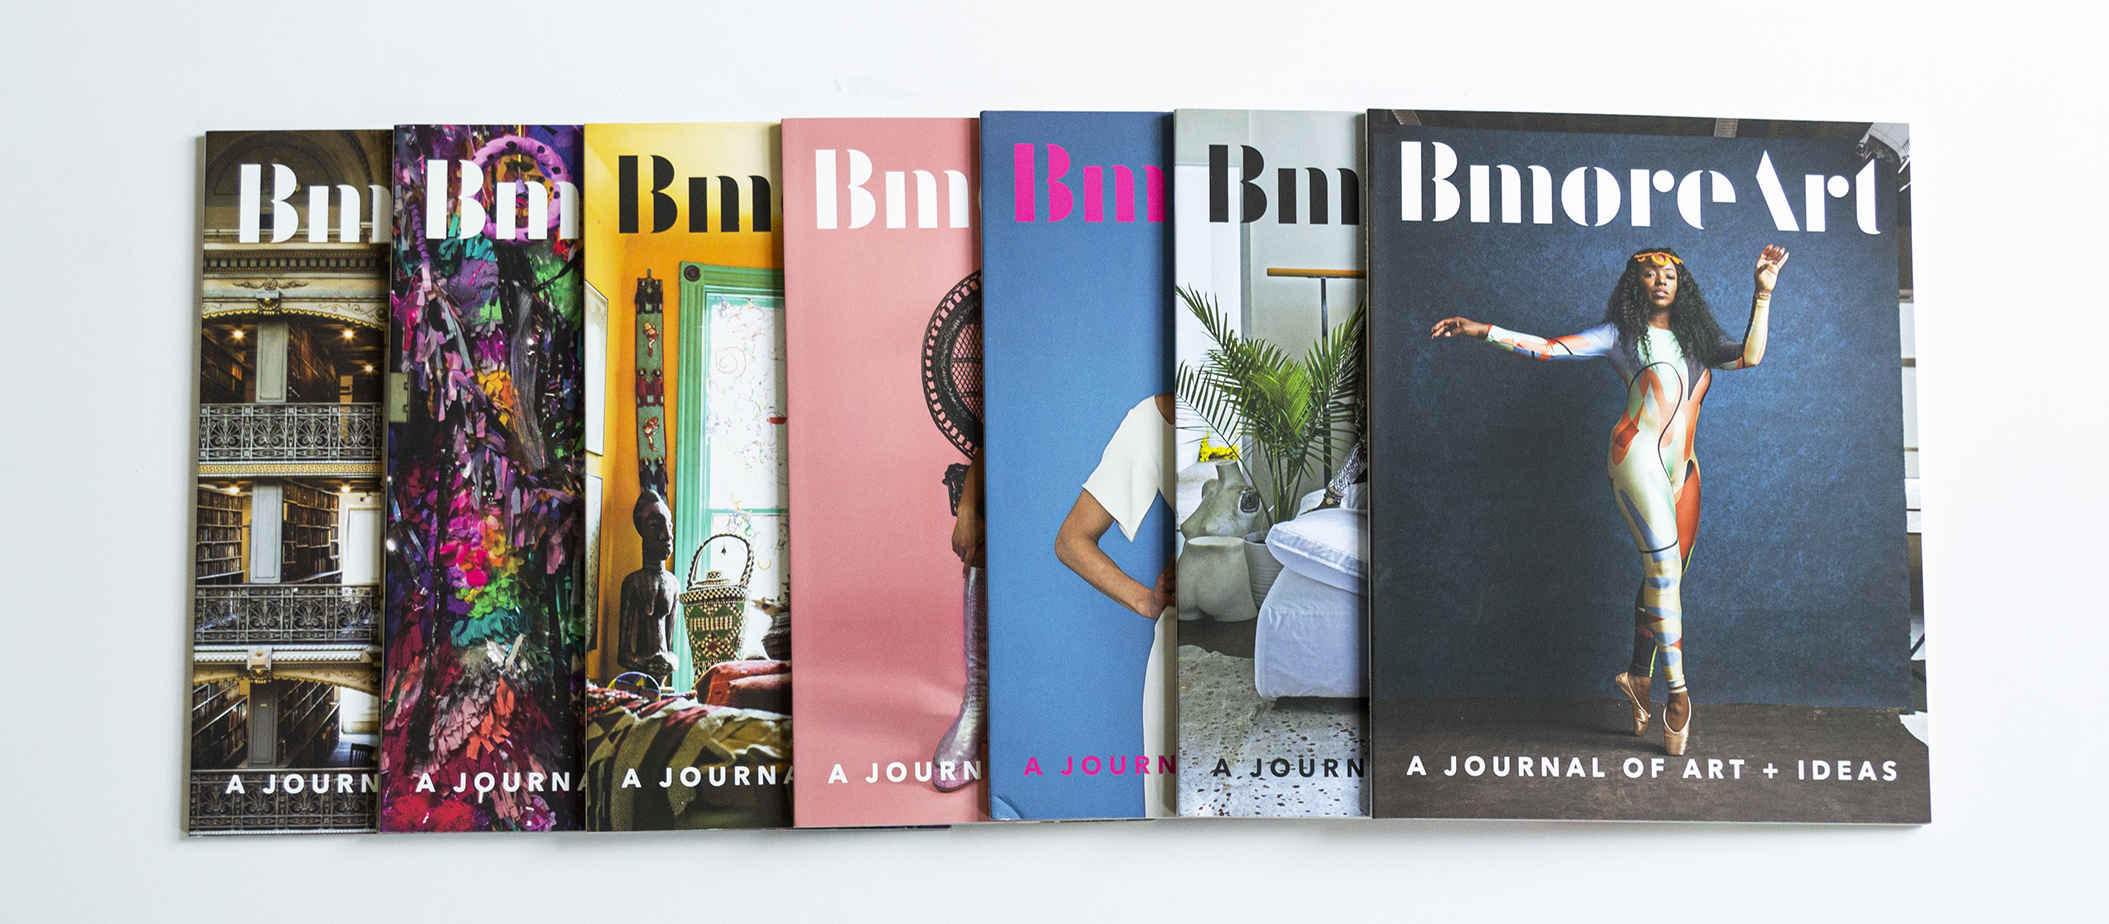 Art Journals And Magazines